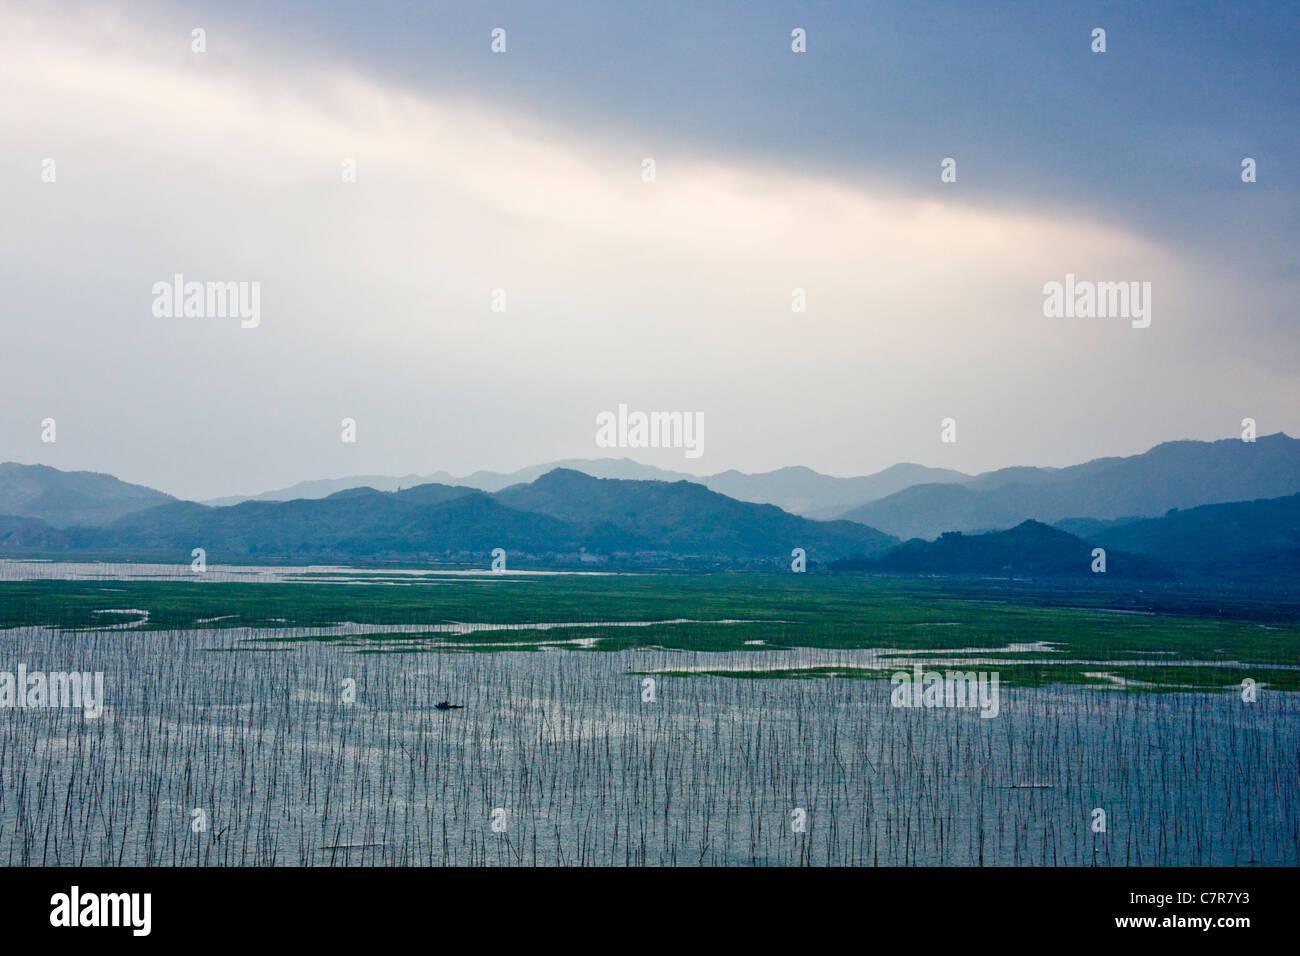 Seaweed farm in the ocean, East China Sea, Xiapu, Fujian, China - Stock Image